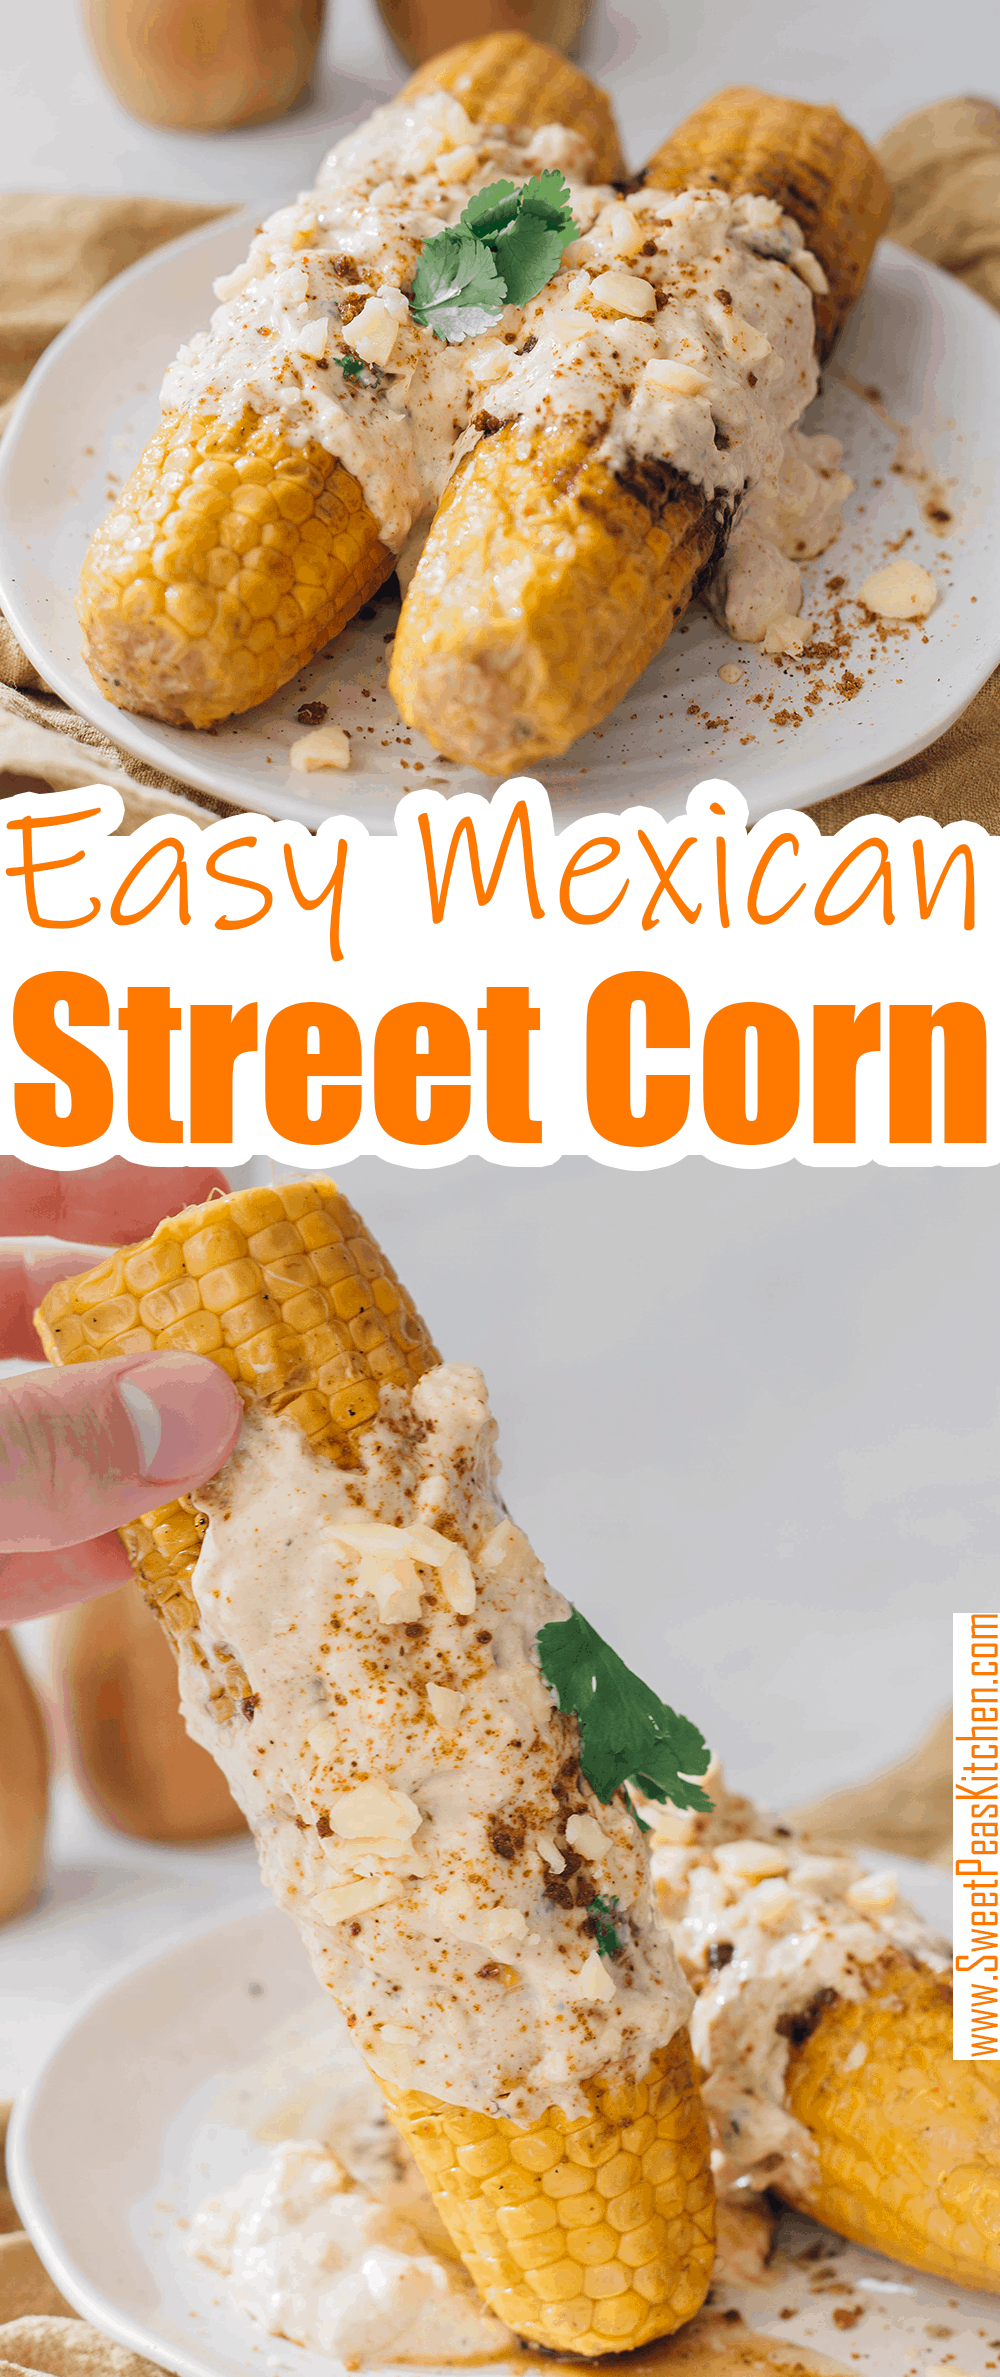 Easy Mexican Street Corn